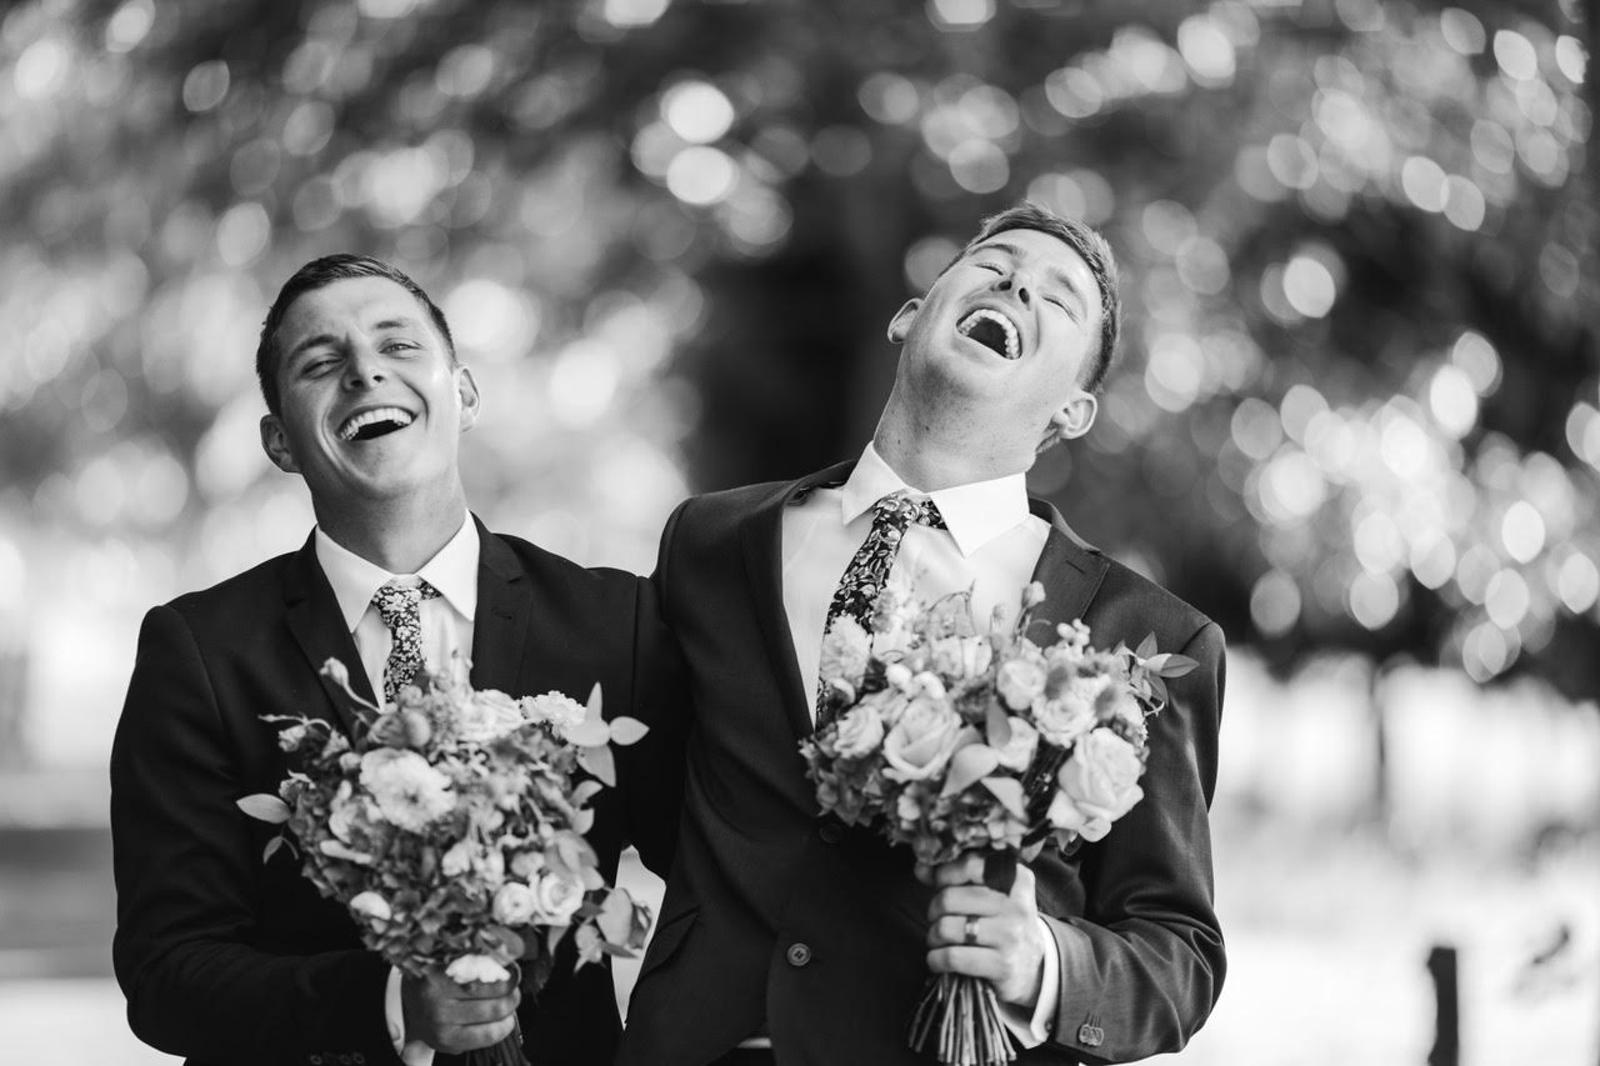 wedding-photography-belinda-pratt05.JPG